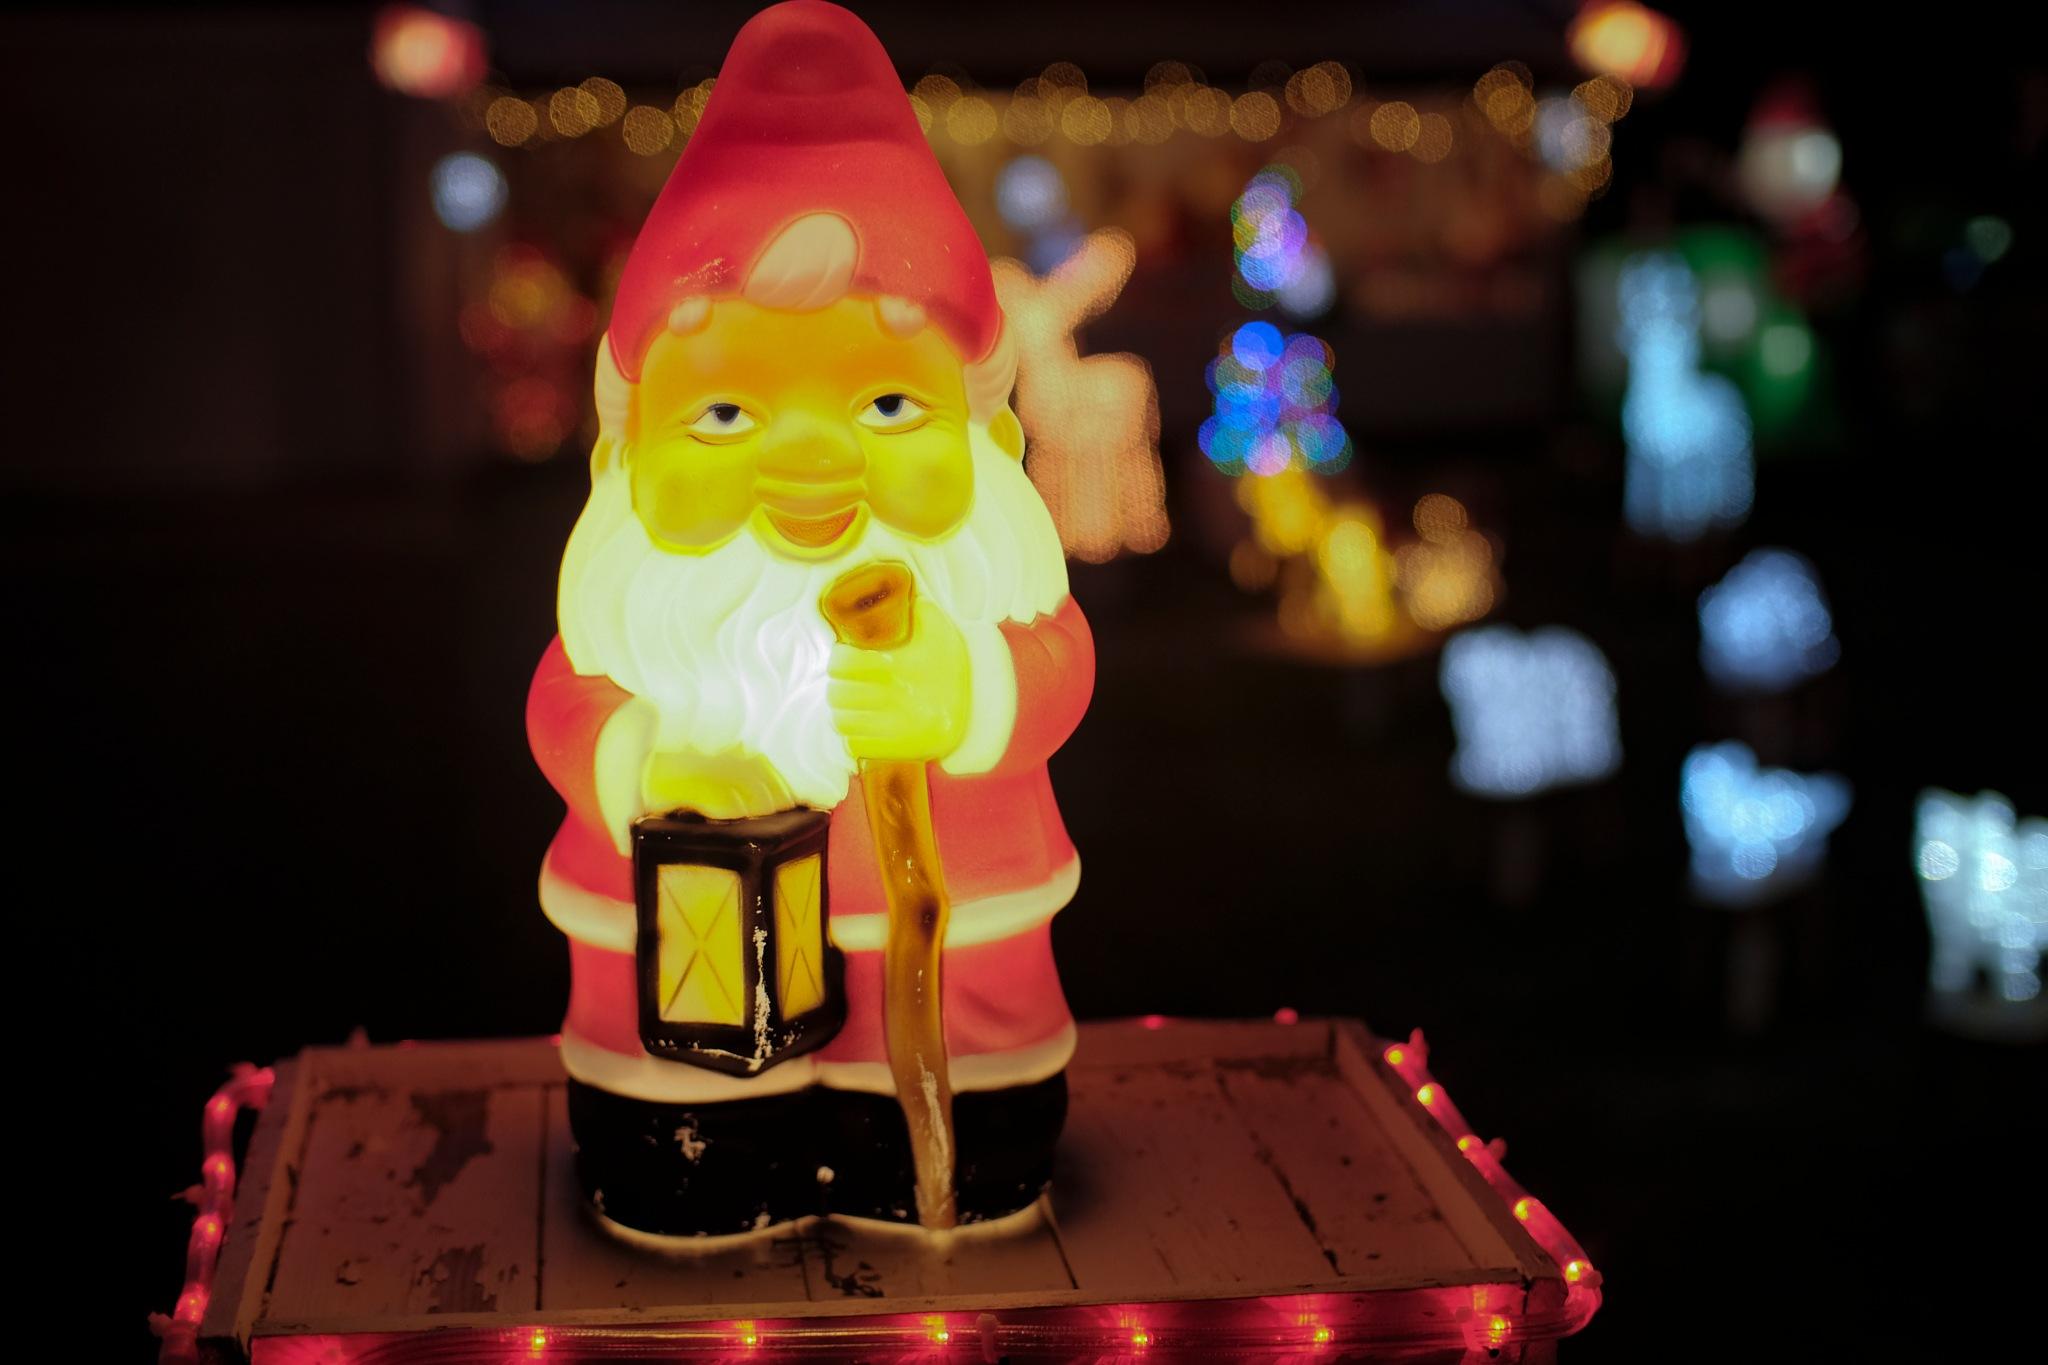 House Owner who likes Christmas by Goran Jorganovich